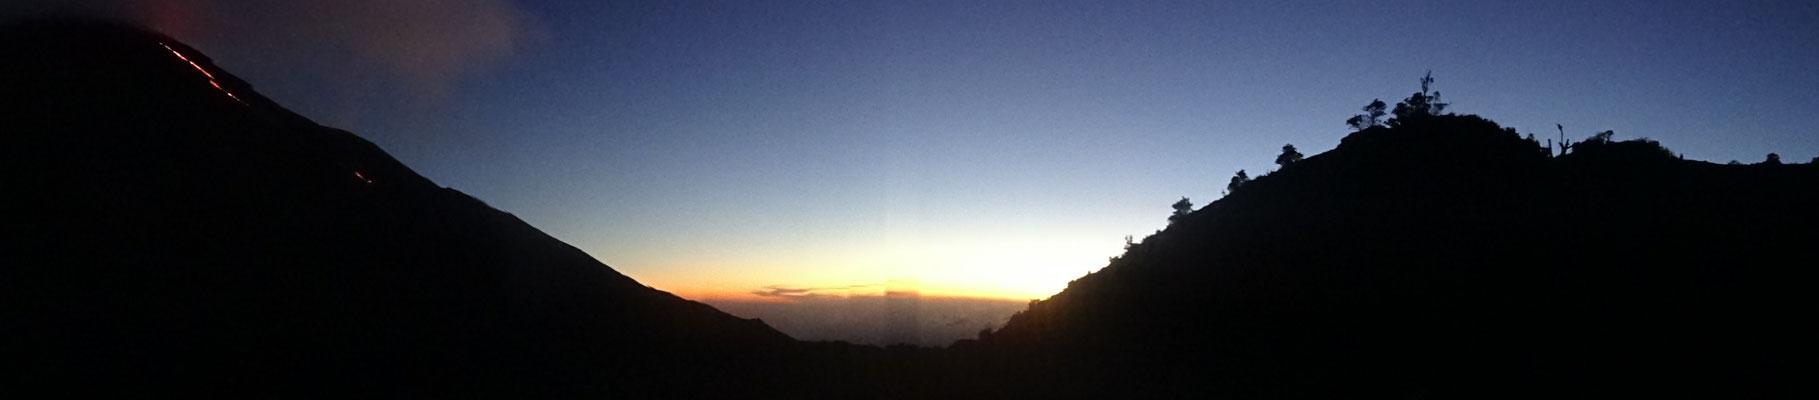 Lavastrom am Vulkan Pagaya (links) und Sonnenuntergang über dem Tal